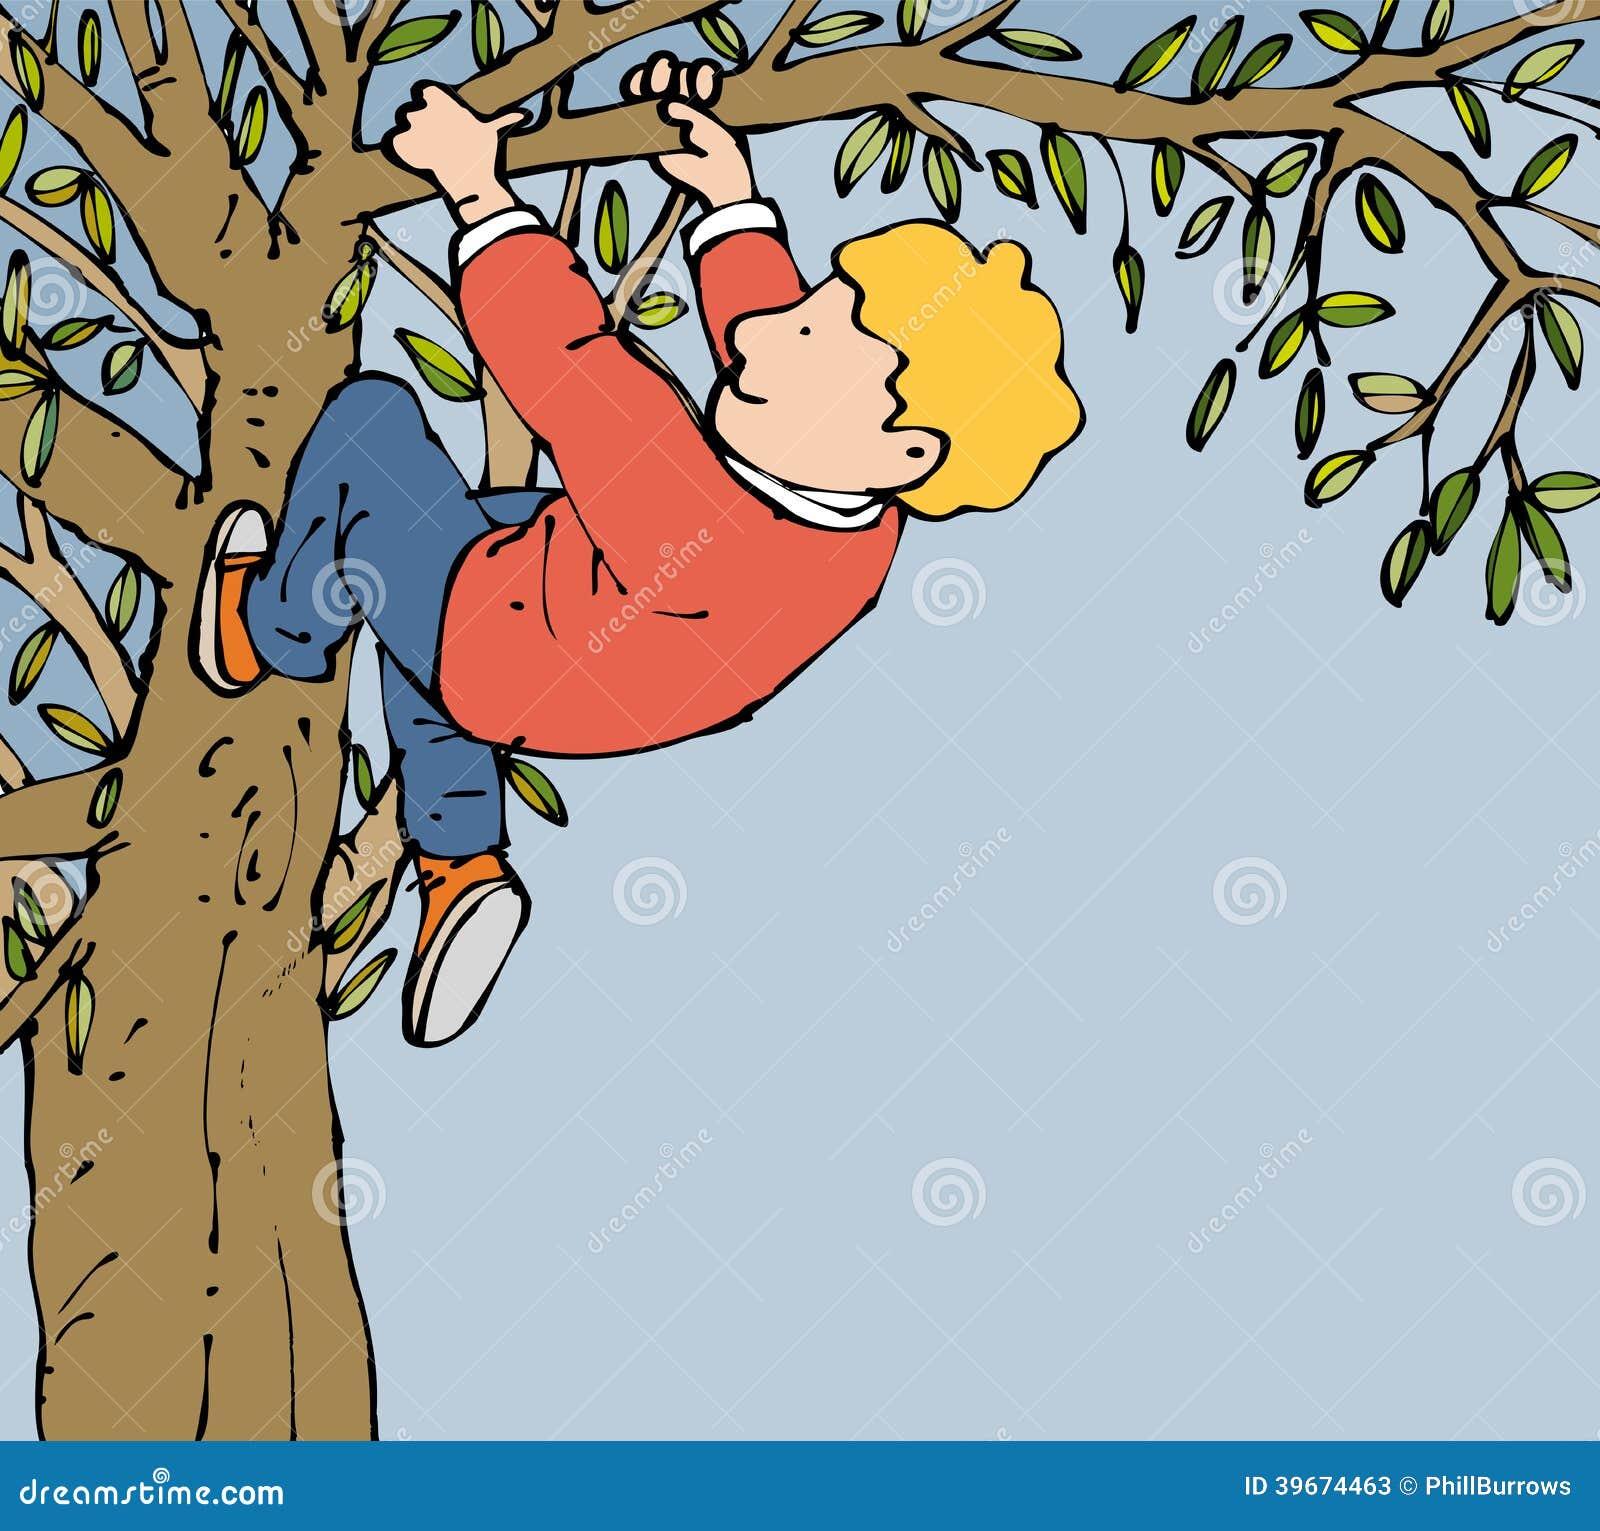 Boy Climbing Tree Stock Illustrations 401 Boy Climbing Tree Stock Illustrations Vectors Clipart Dreamstime Or should i say morning. dreamstime com